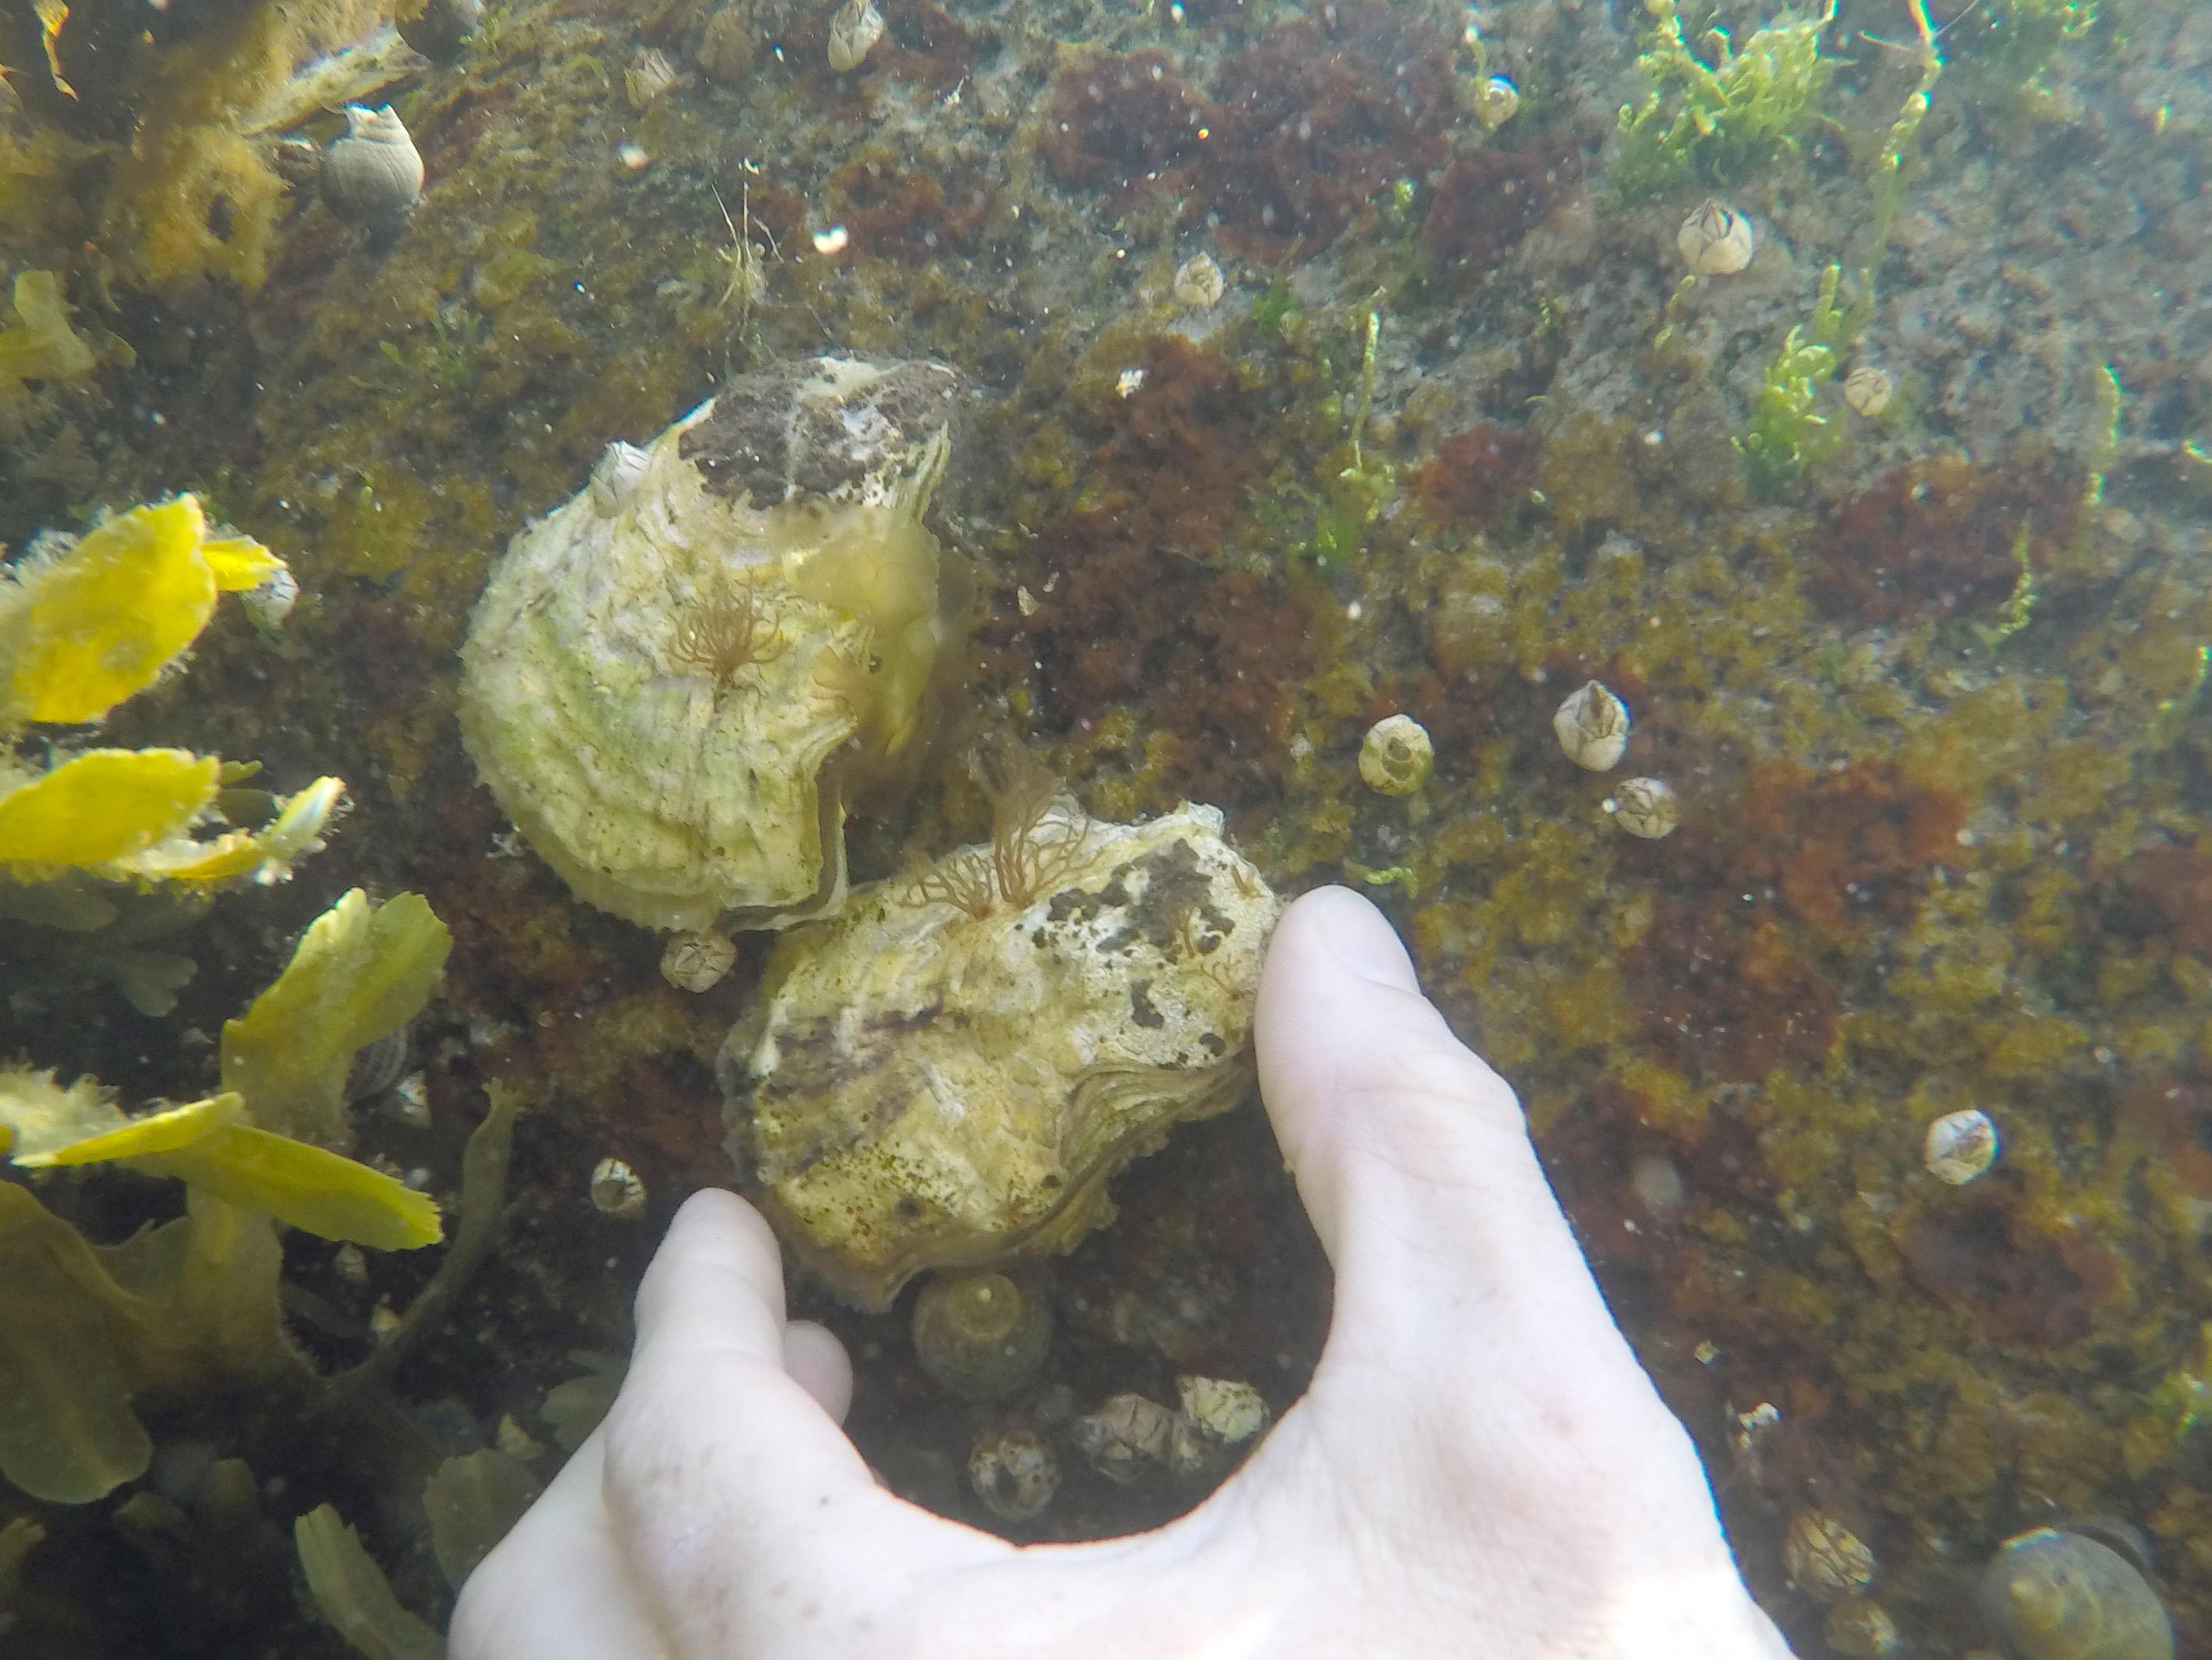 Stillehavsøsters - Østers på sten i Svanemøllebugten